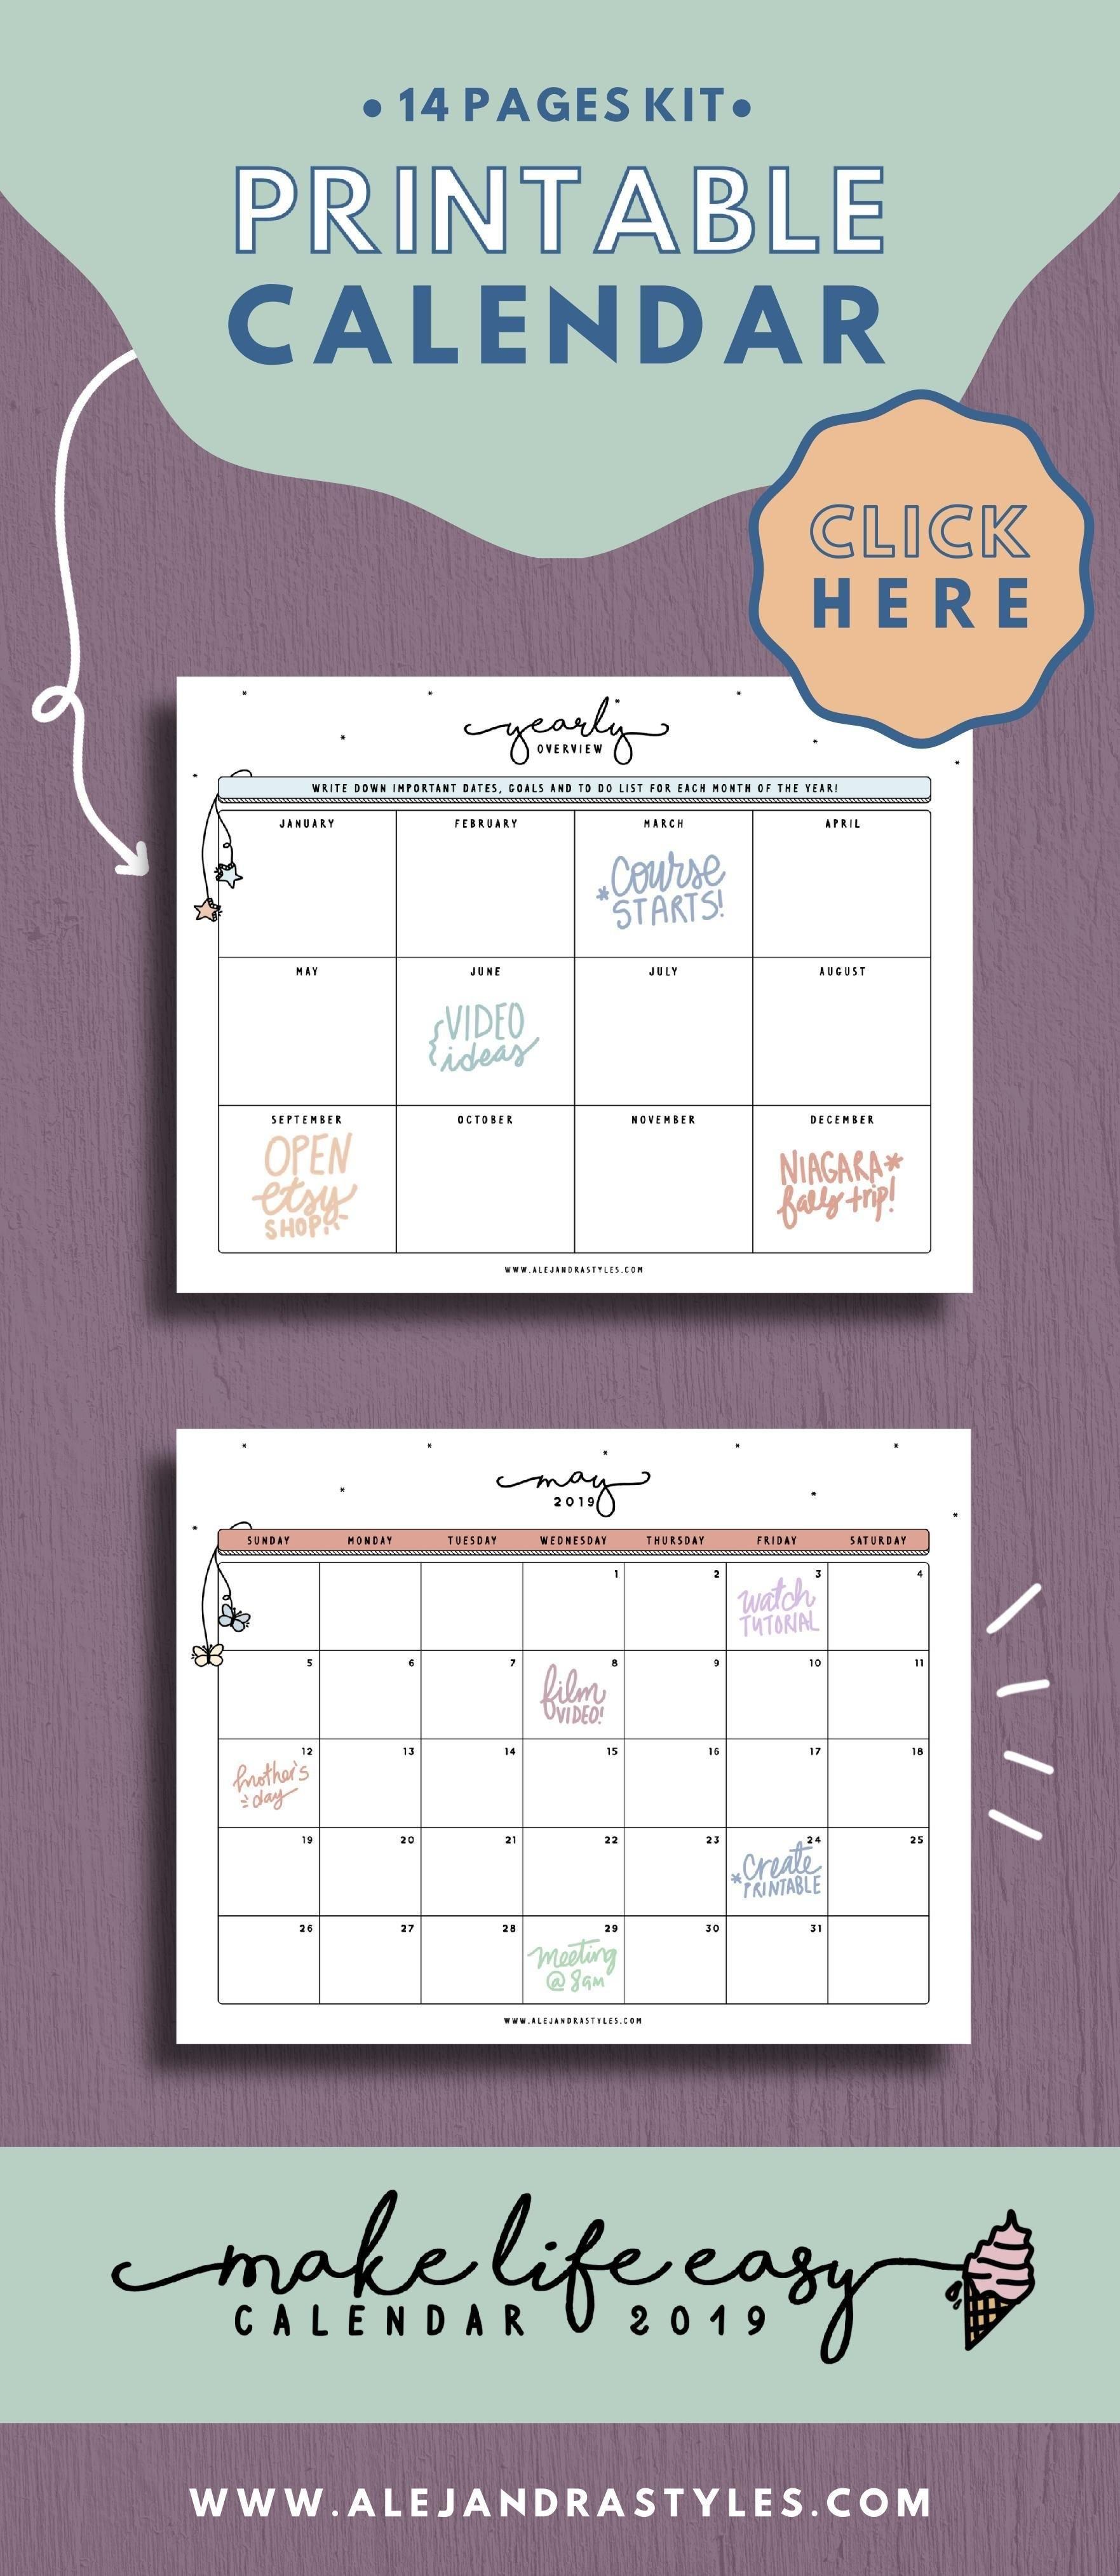 2019 Calendar Printable Planner For Desk Or Wall   Monday And Sunday Busy B Desktop Calendar 2019